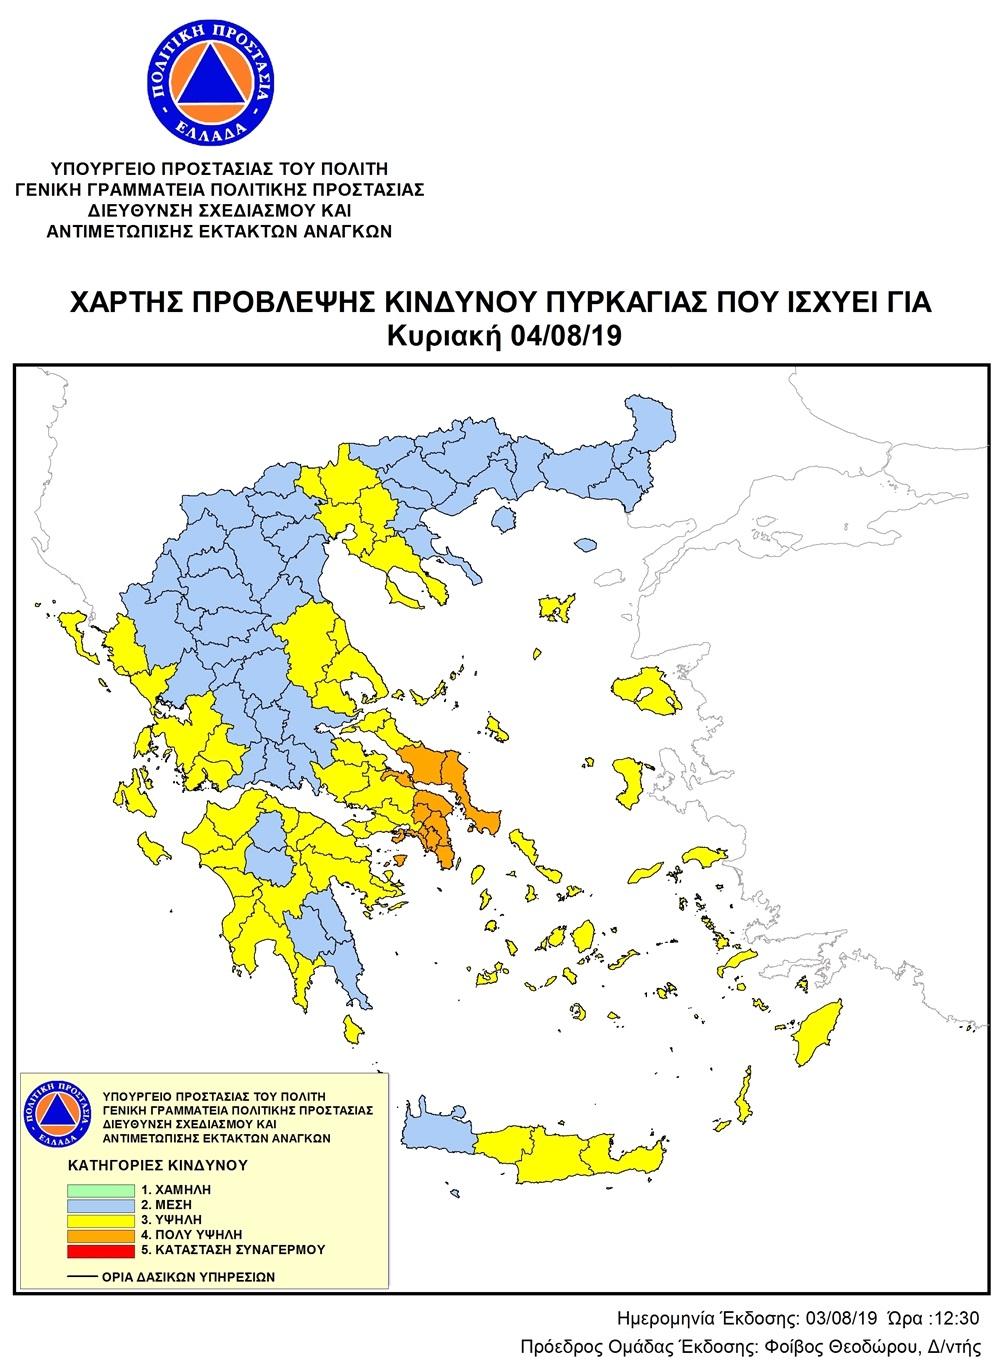 Yψηλός κίνδυνος πυρκαγιάς την Κυριακή 4 Αυγούστου 2019  σε όλη τη Δυτική Ελλάδα – Τι πρέπει να προσέχουν οι πολίτες